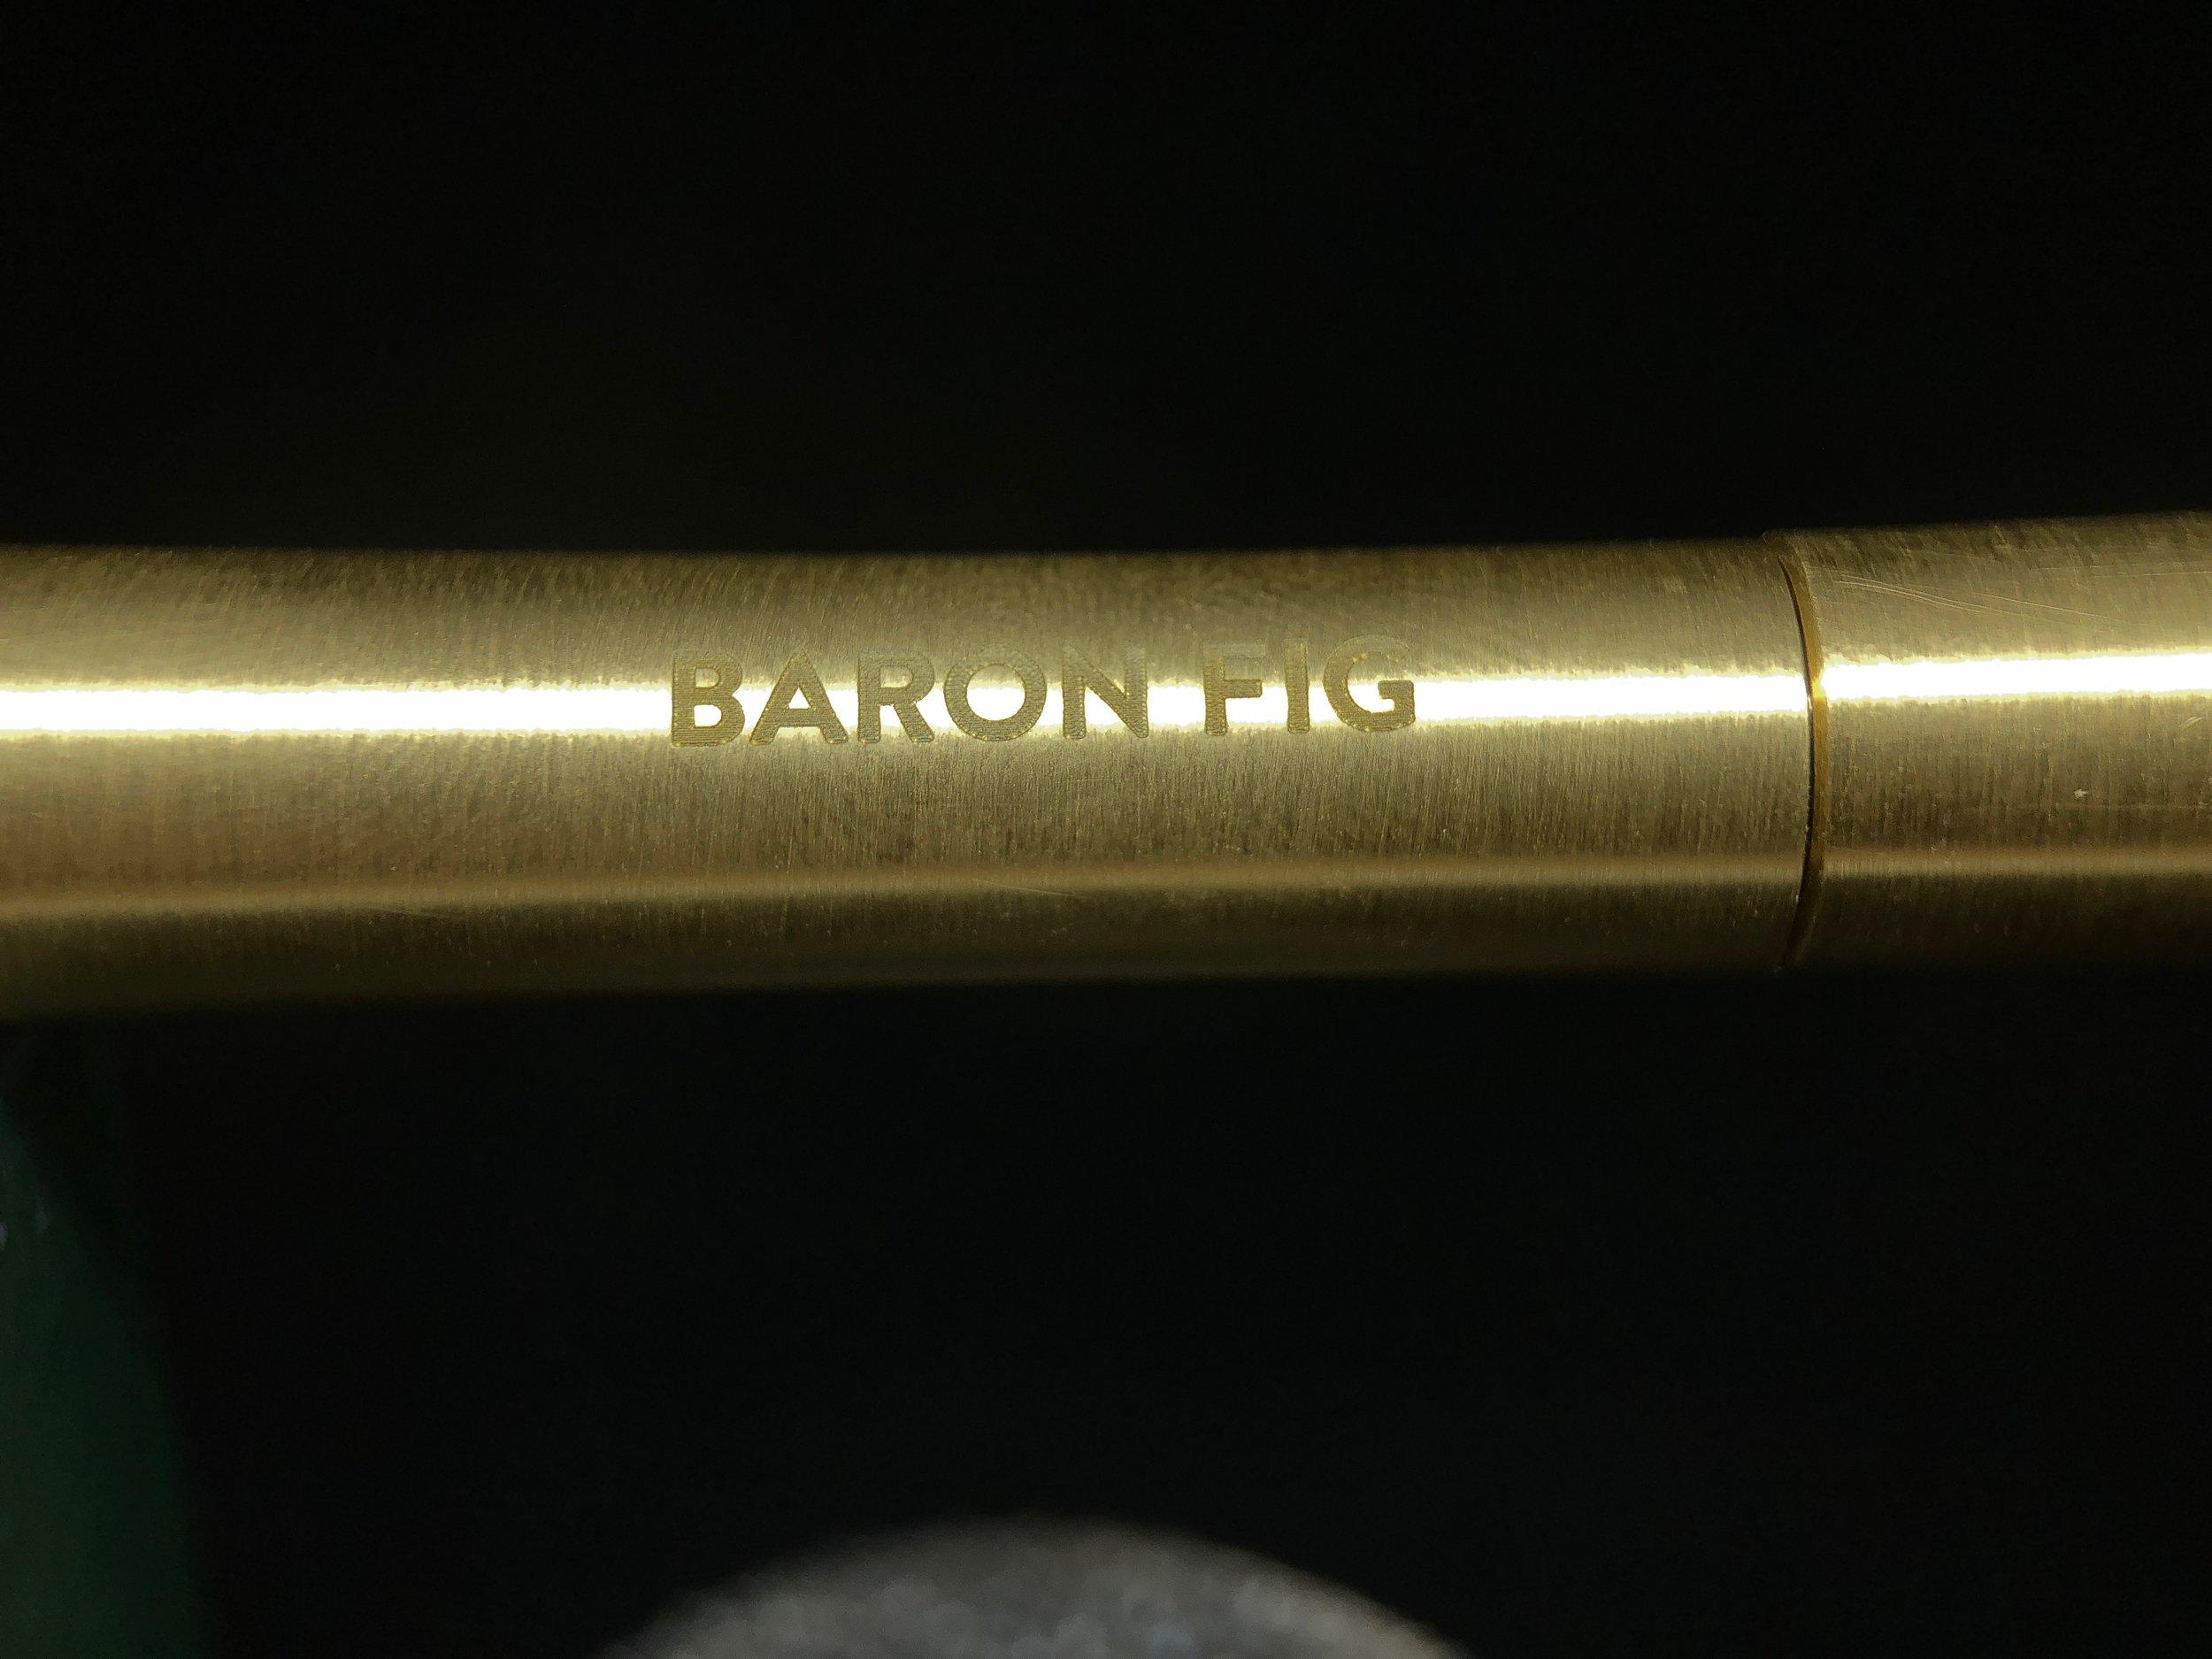 baron-fig-squire-pen-key-brass-8.jpg